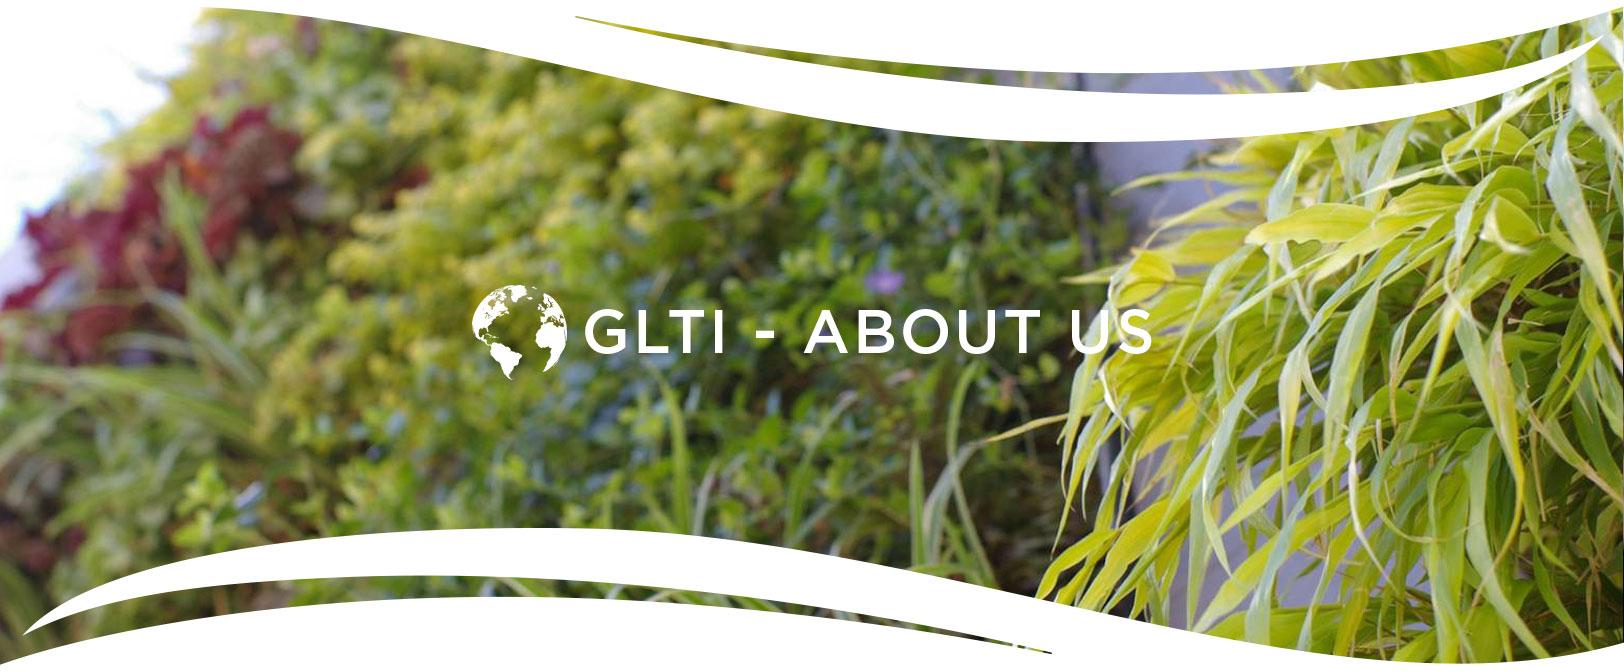 About GLTI. Green Living Technologies International